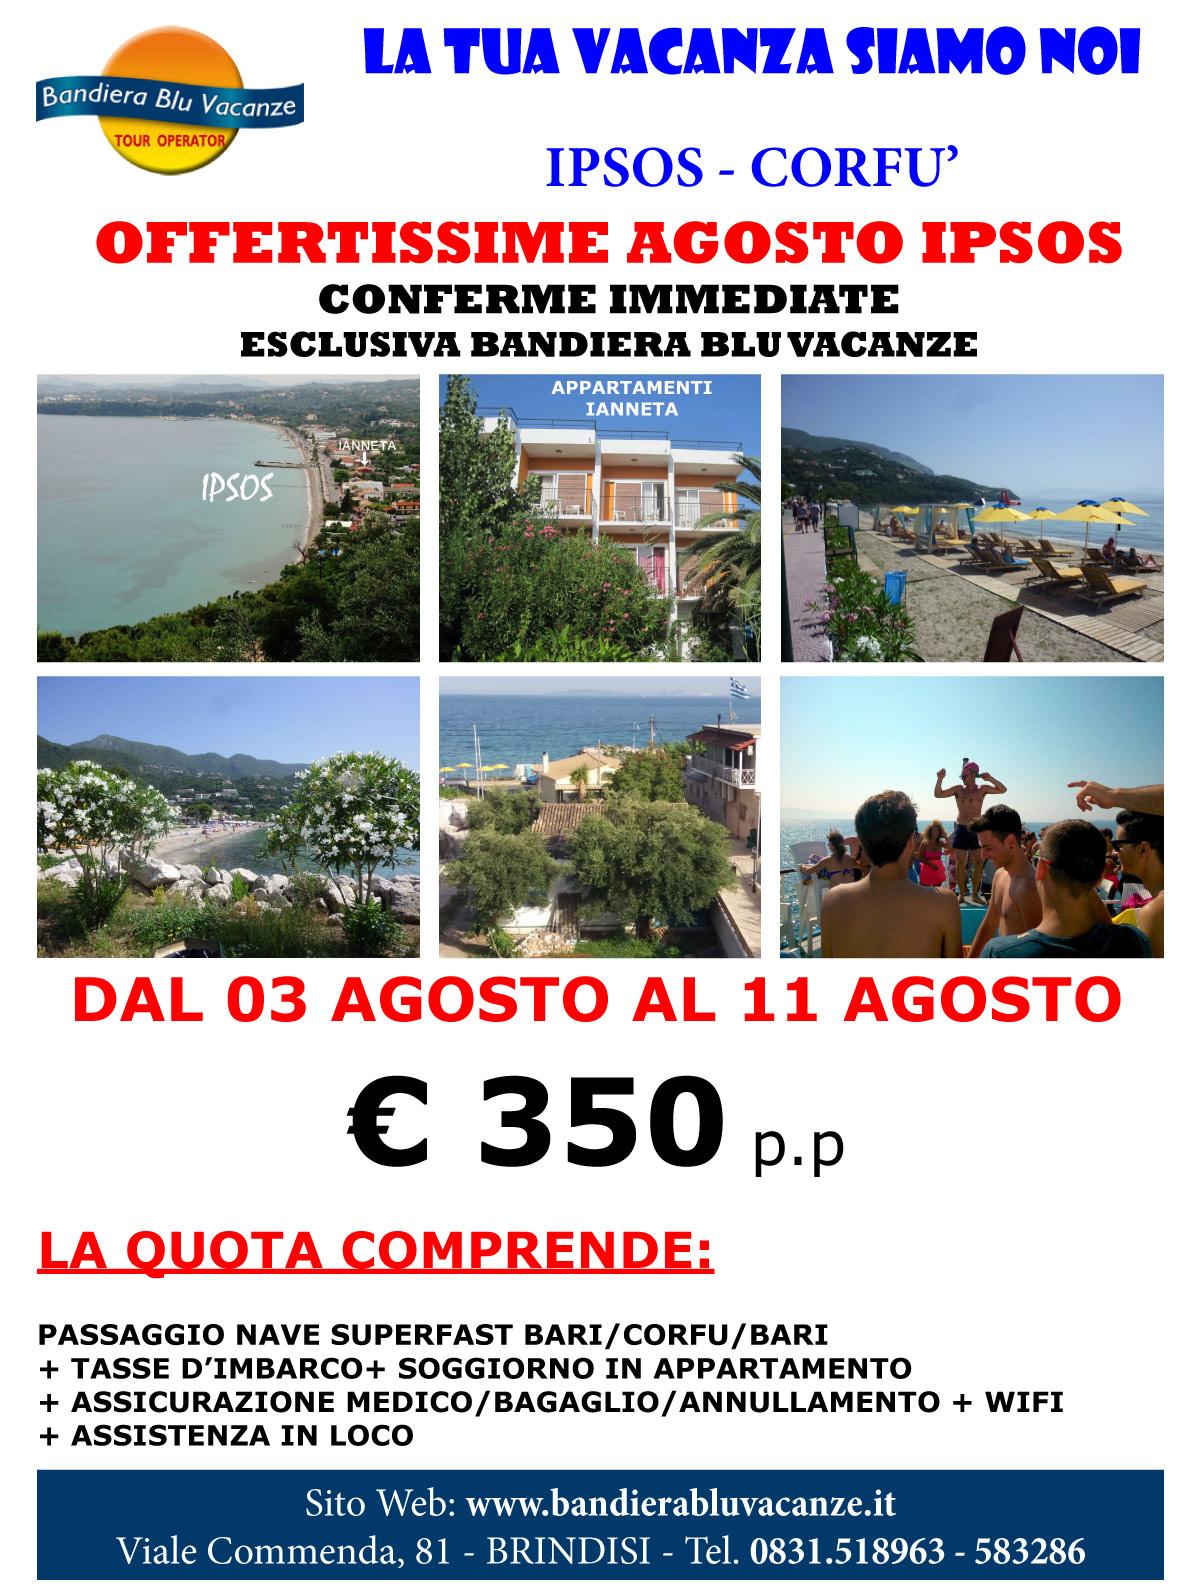 Corfù - Ipsos: La Tua Vacanza Siamo Noi - Dal 03 al 11 Agosto - Ianneta